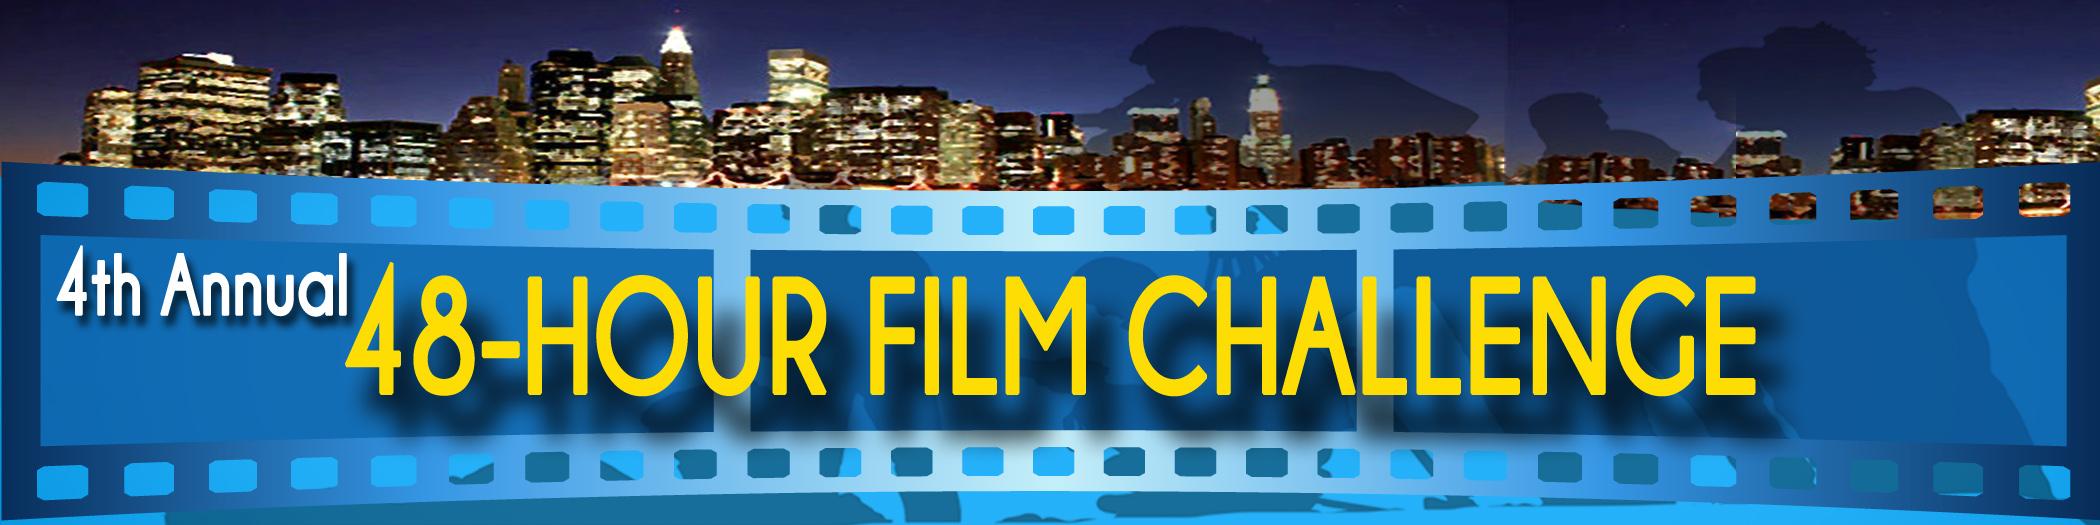 WFA2016 48-Hour Film Challenge